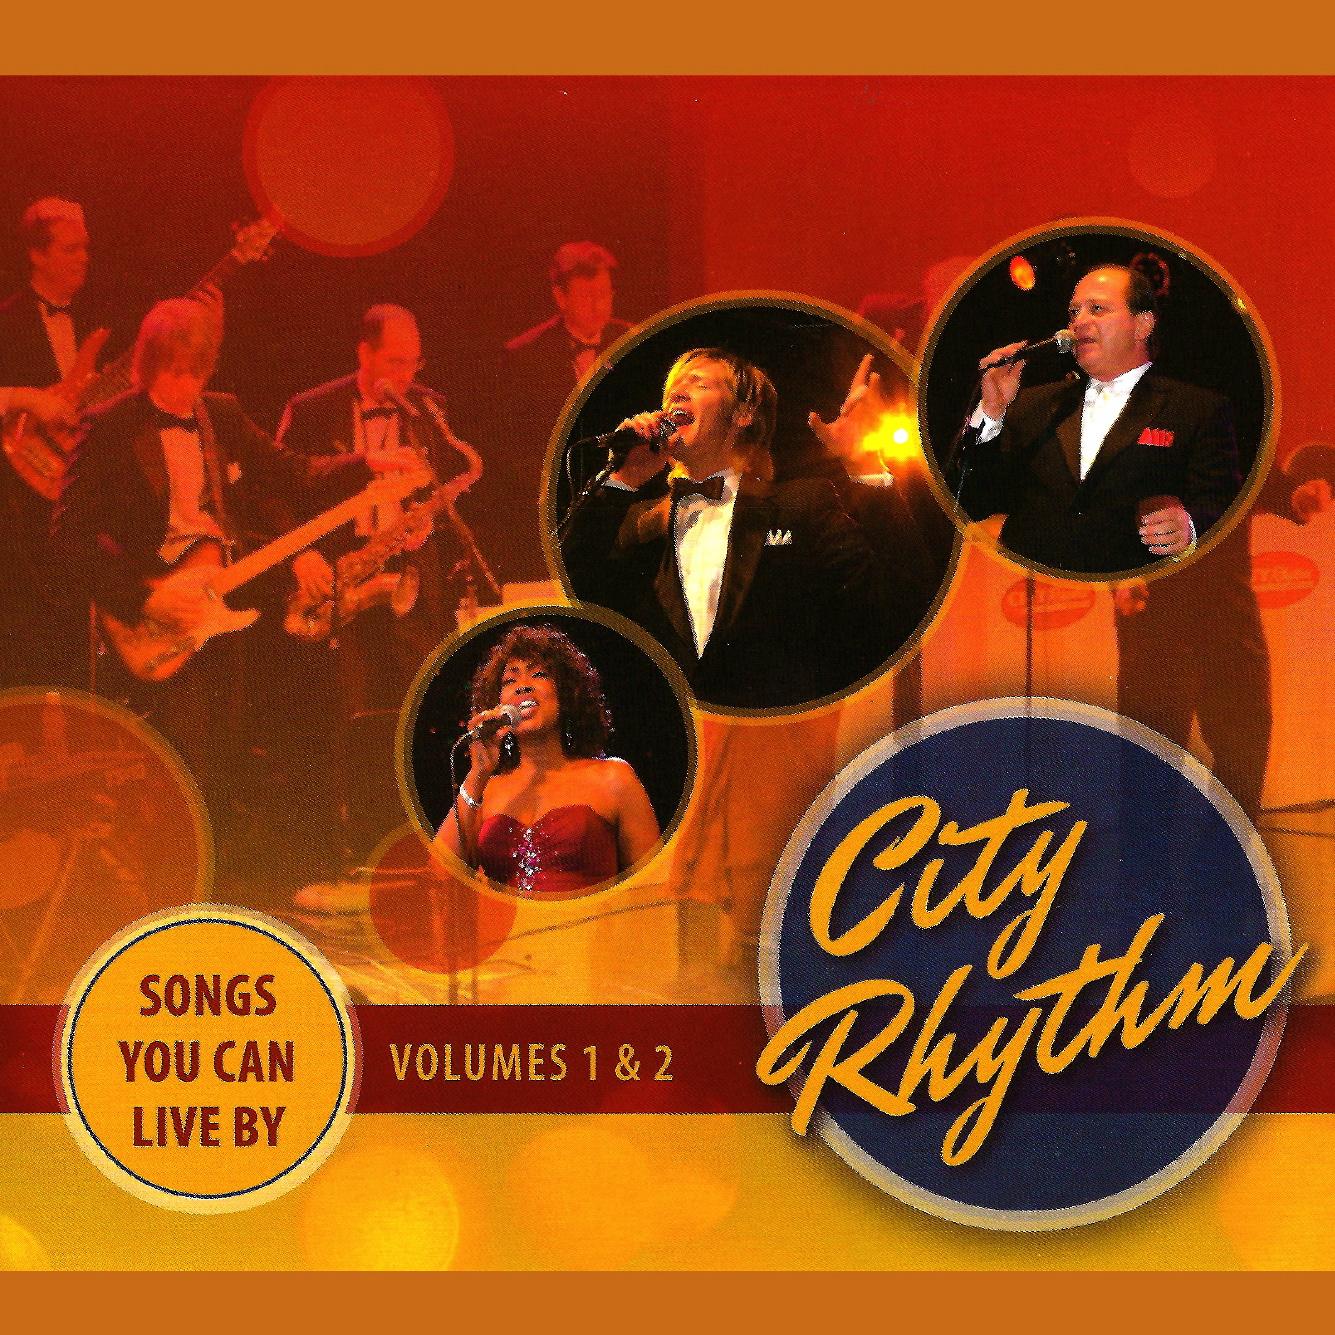 cds - Version 2.jpg